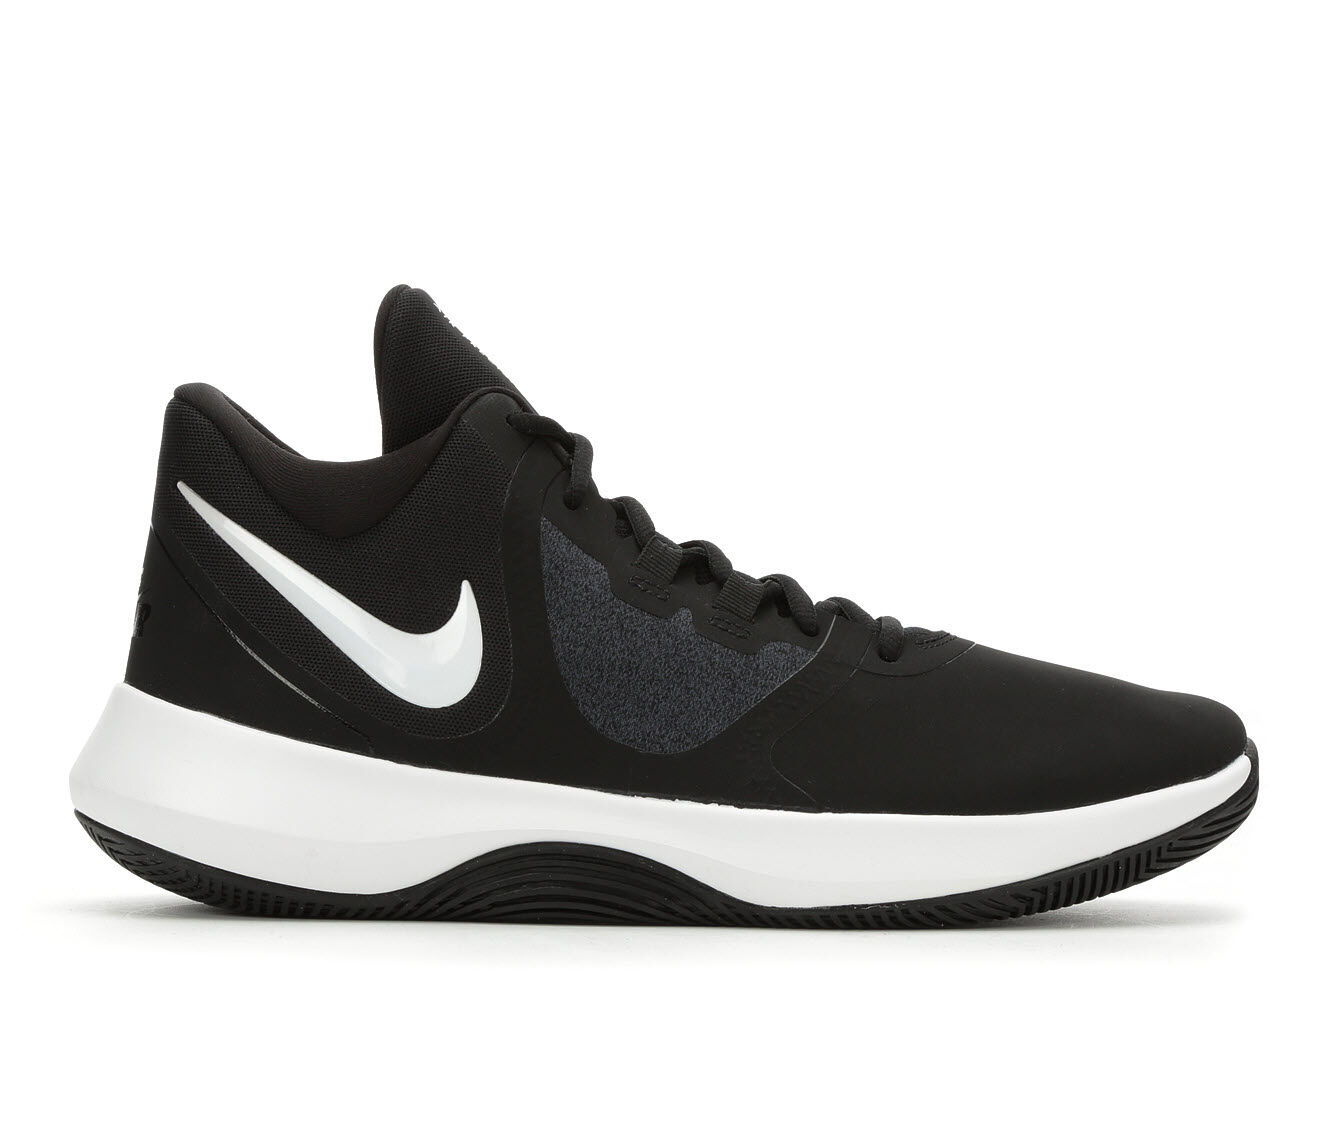 Men's Nike Air Precision II Nubuck Basketball Shoes Black/White 001